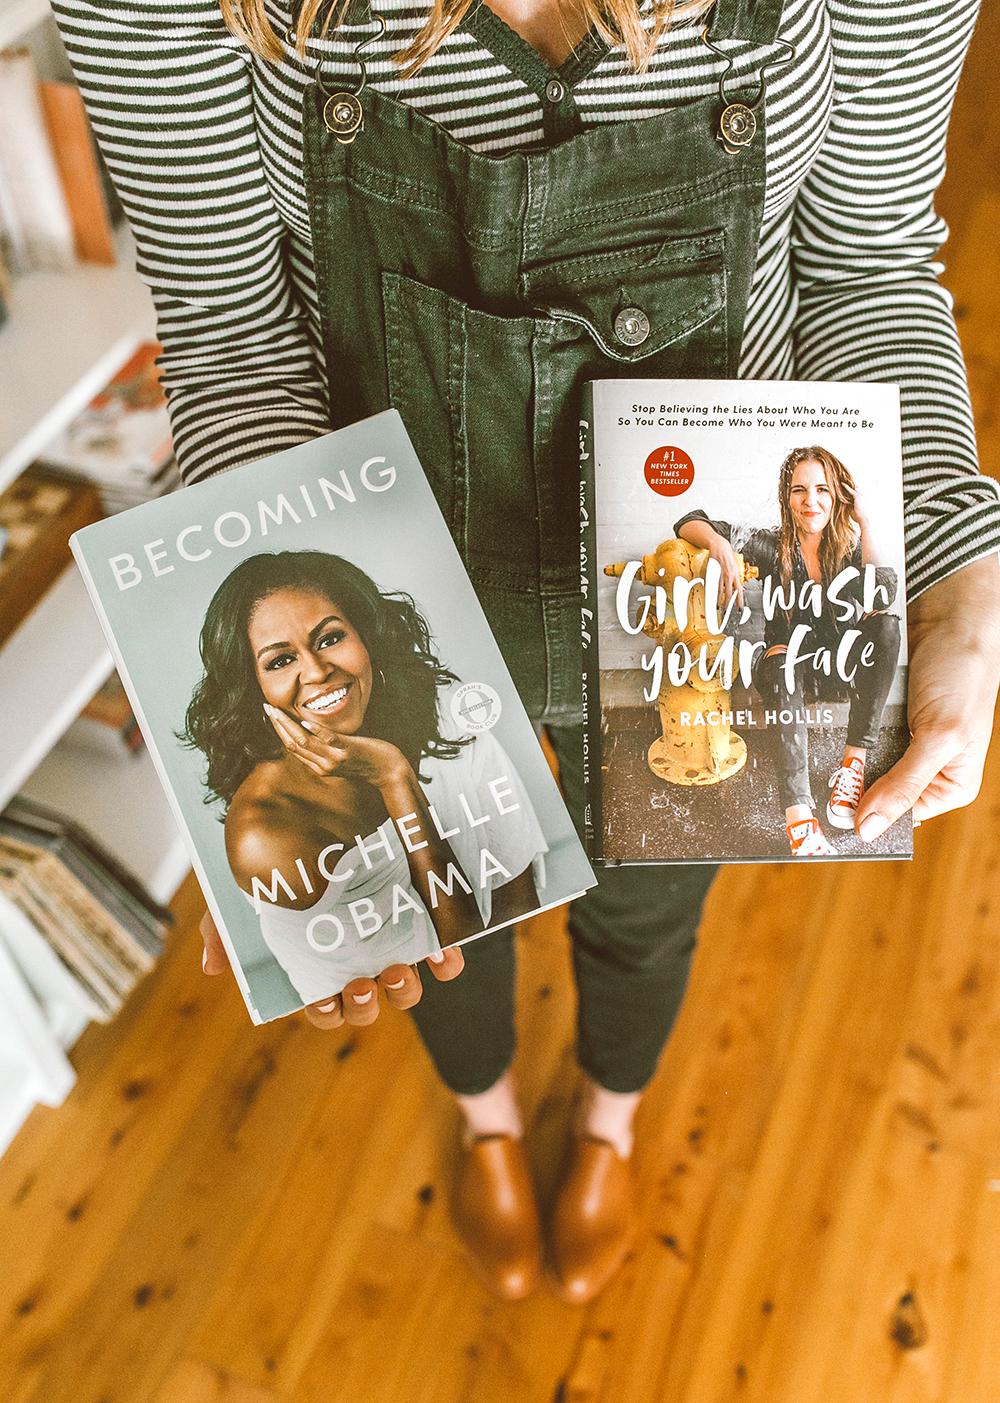 livvyland-blog-olivia-watson-austin-texas-lifestyle-blogger-best-inspiring-books-2018-2019-2